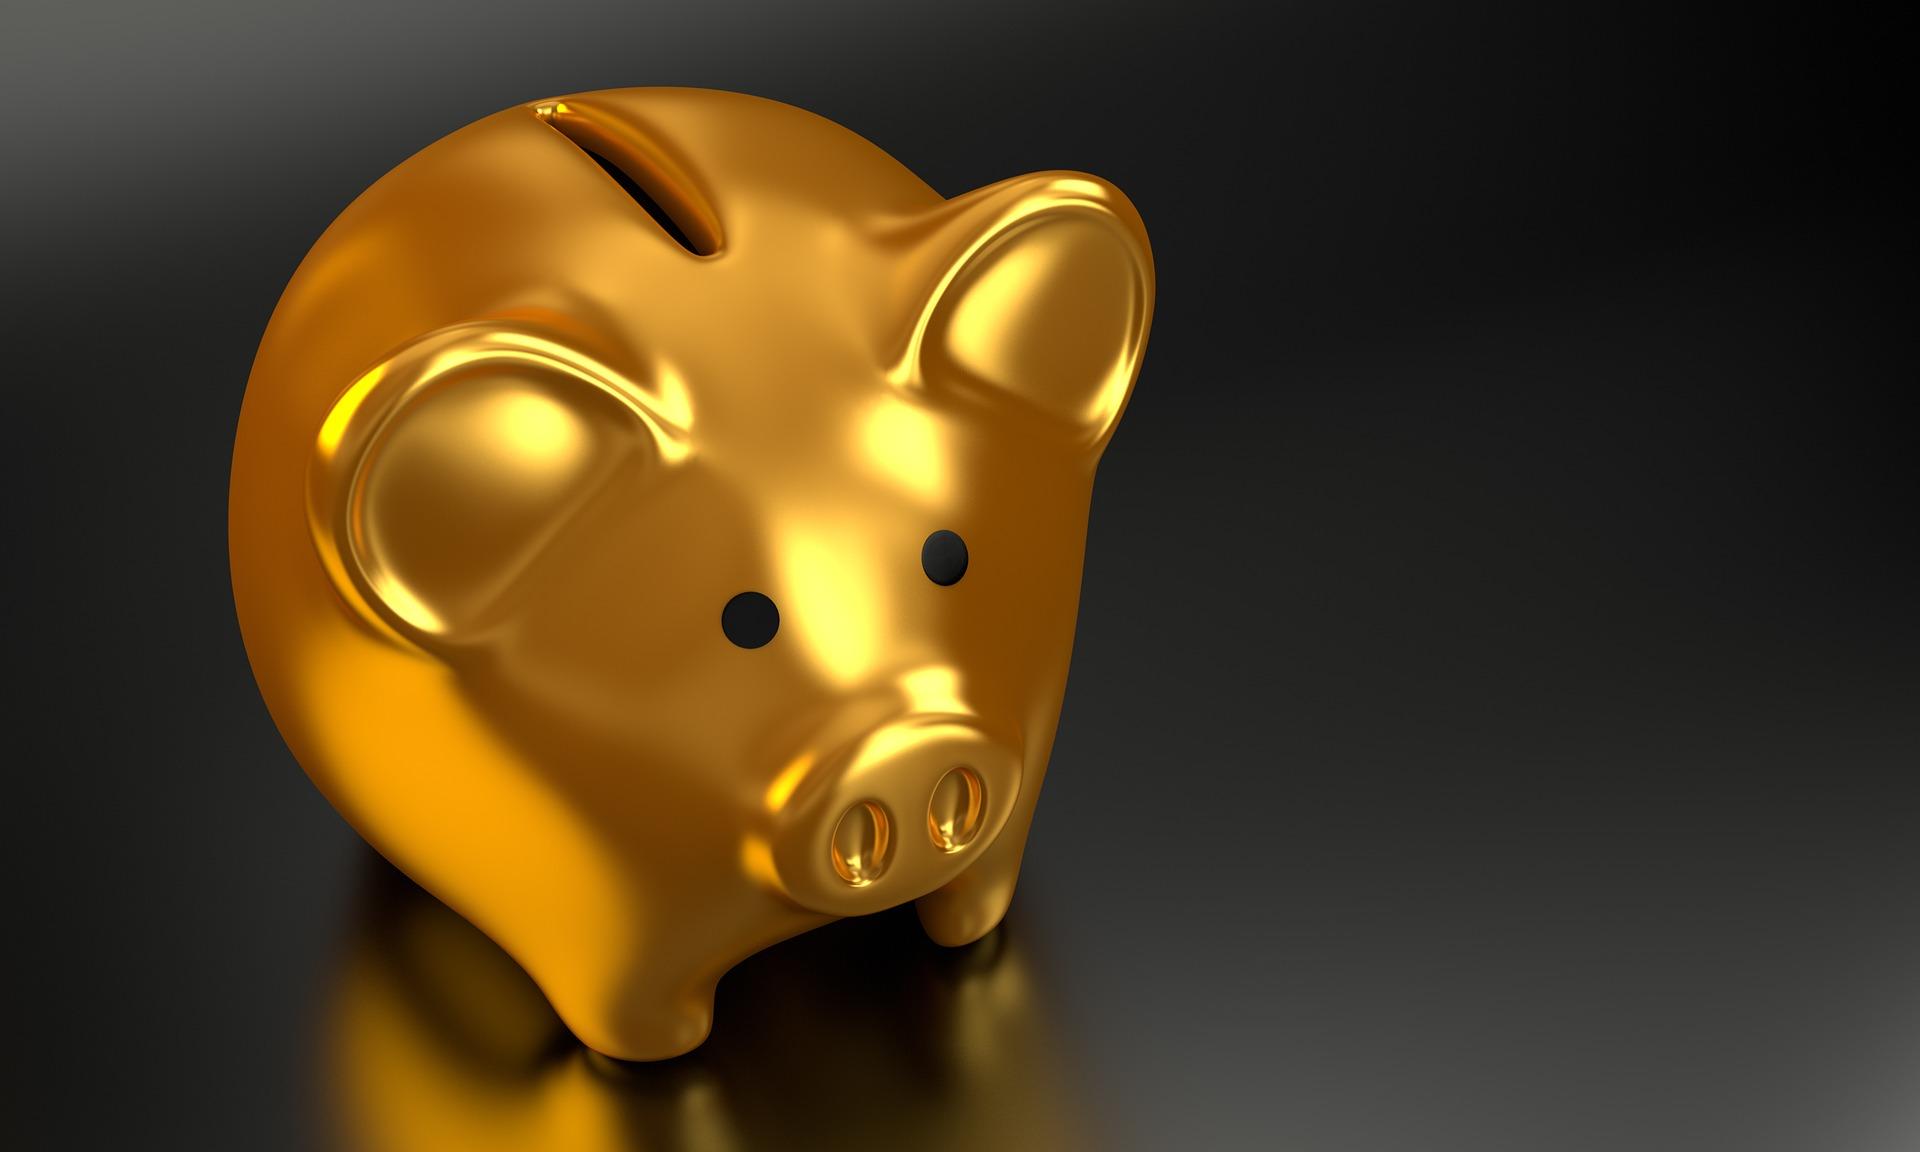 A Response to Consumer Outrage Towards the Banking Establishment